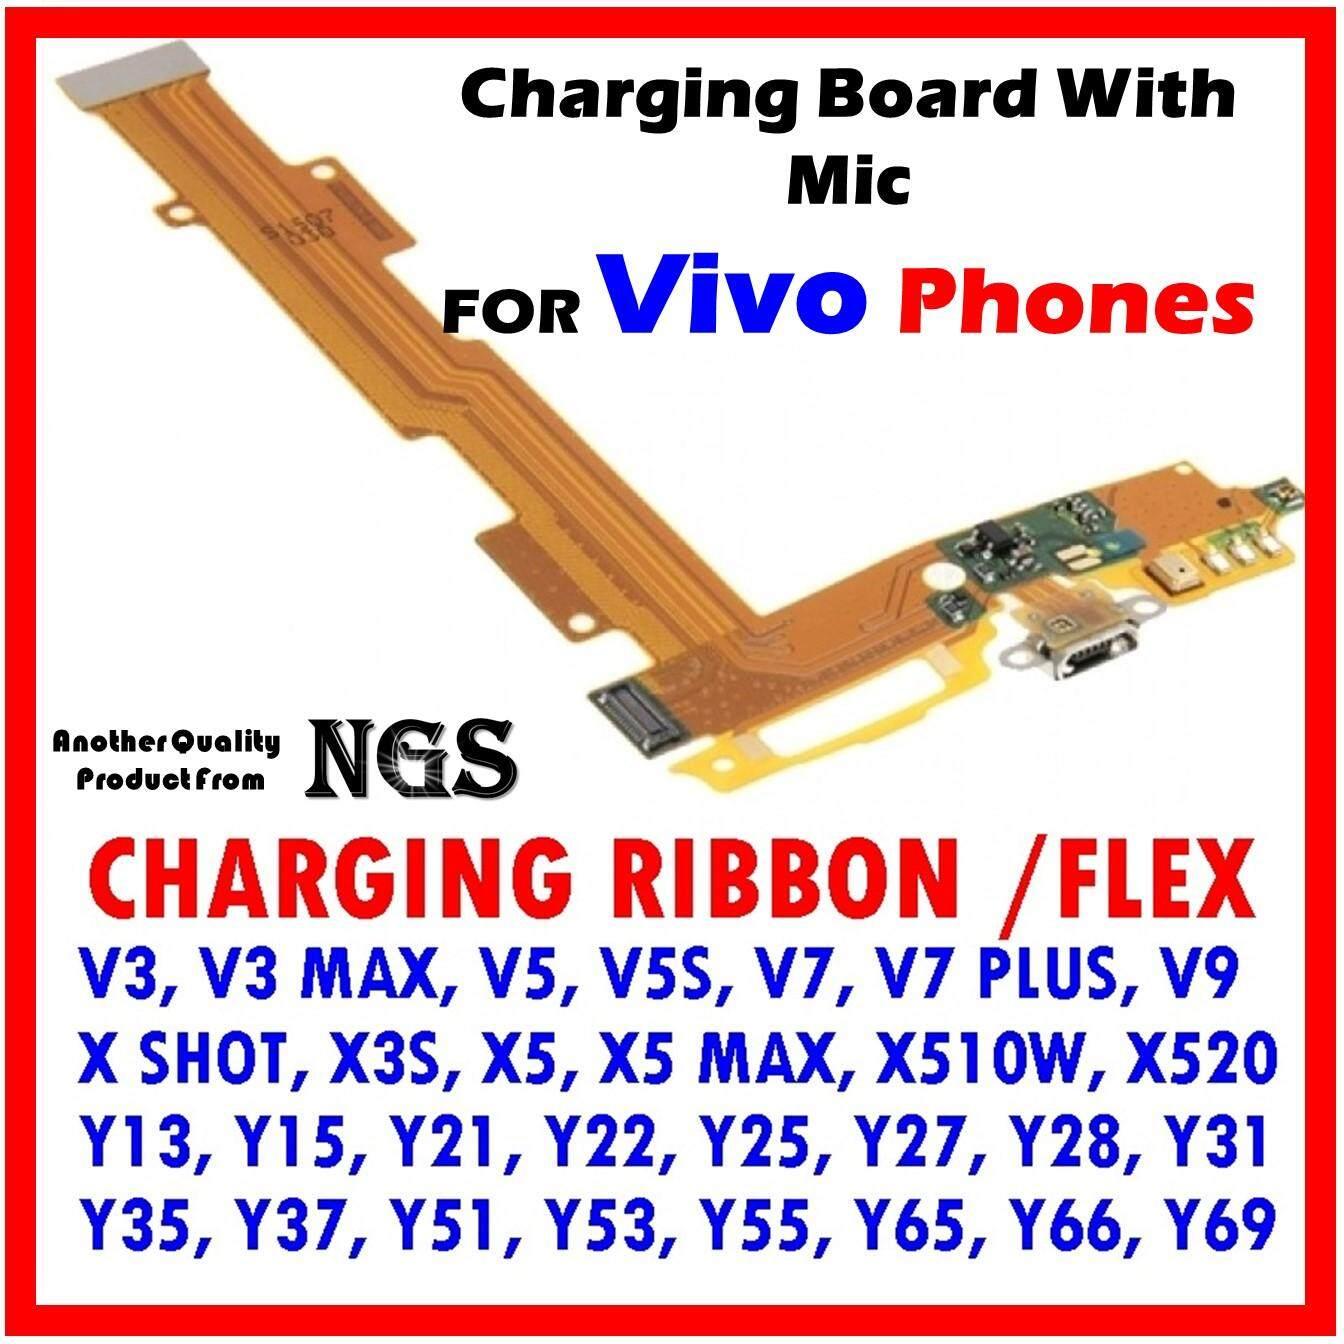 Charging Ribbon For VIVO V3 MAX V5 V7 PLUS V9 X SHOT X3S X5 X5 MAX X510W  X520 Y13 Y15 Y21 Y22 Y25 Y27 Y28 Y31 Y35 Y37 Y51 Y53 Y55 Y65 Y66 Y69 V5S